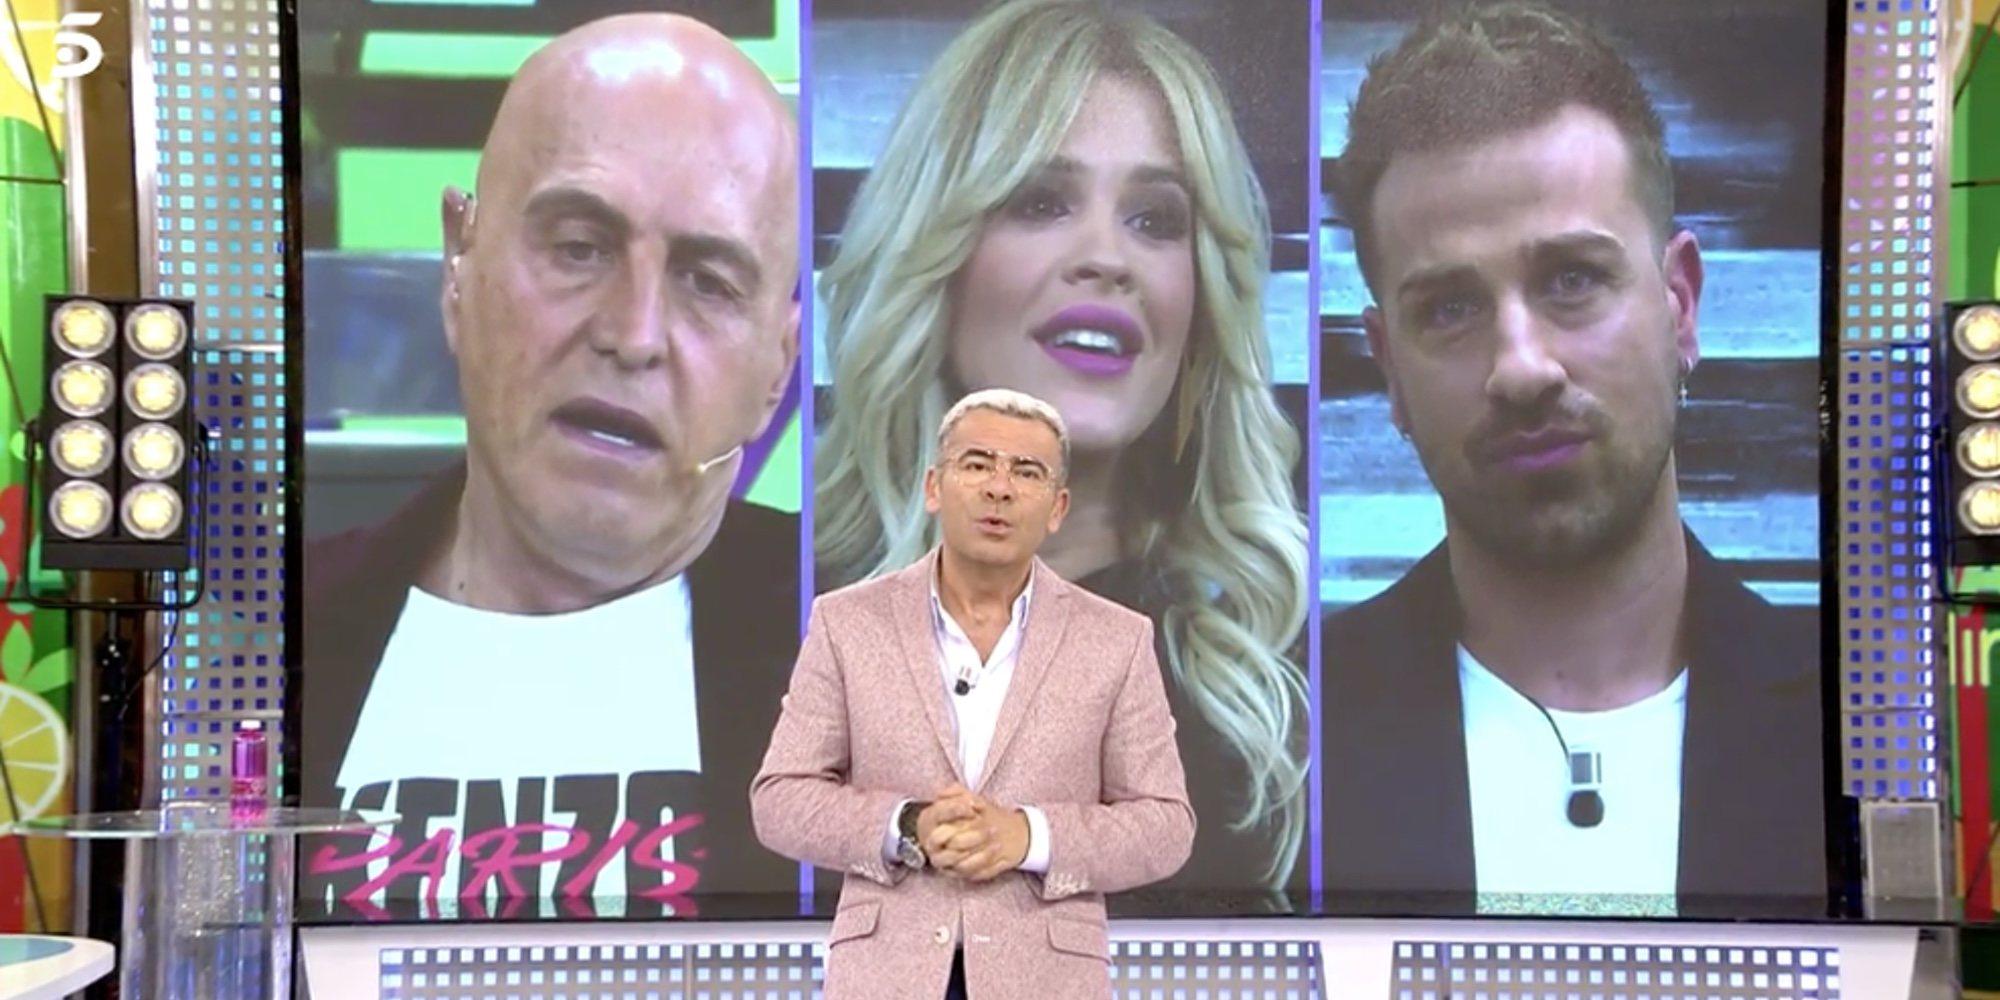 Jorge Javier Vázquez se disculpa en 'Sálvame' por la discusión de Ylenia, Rafa Mora y Kiko Matamoros